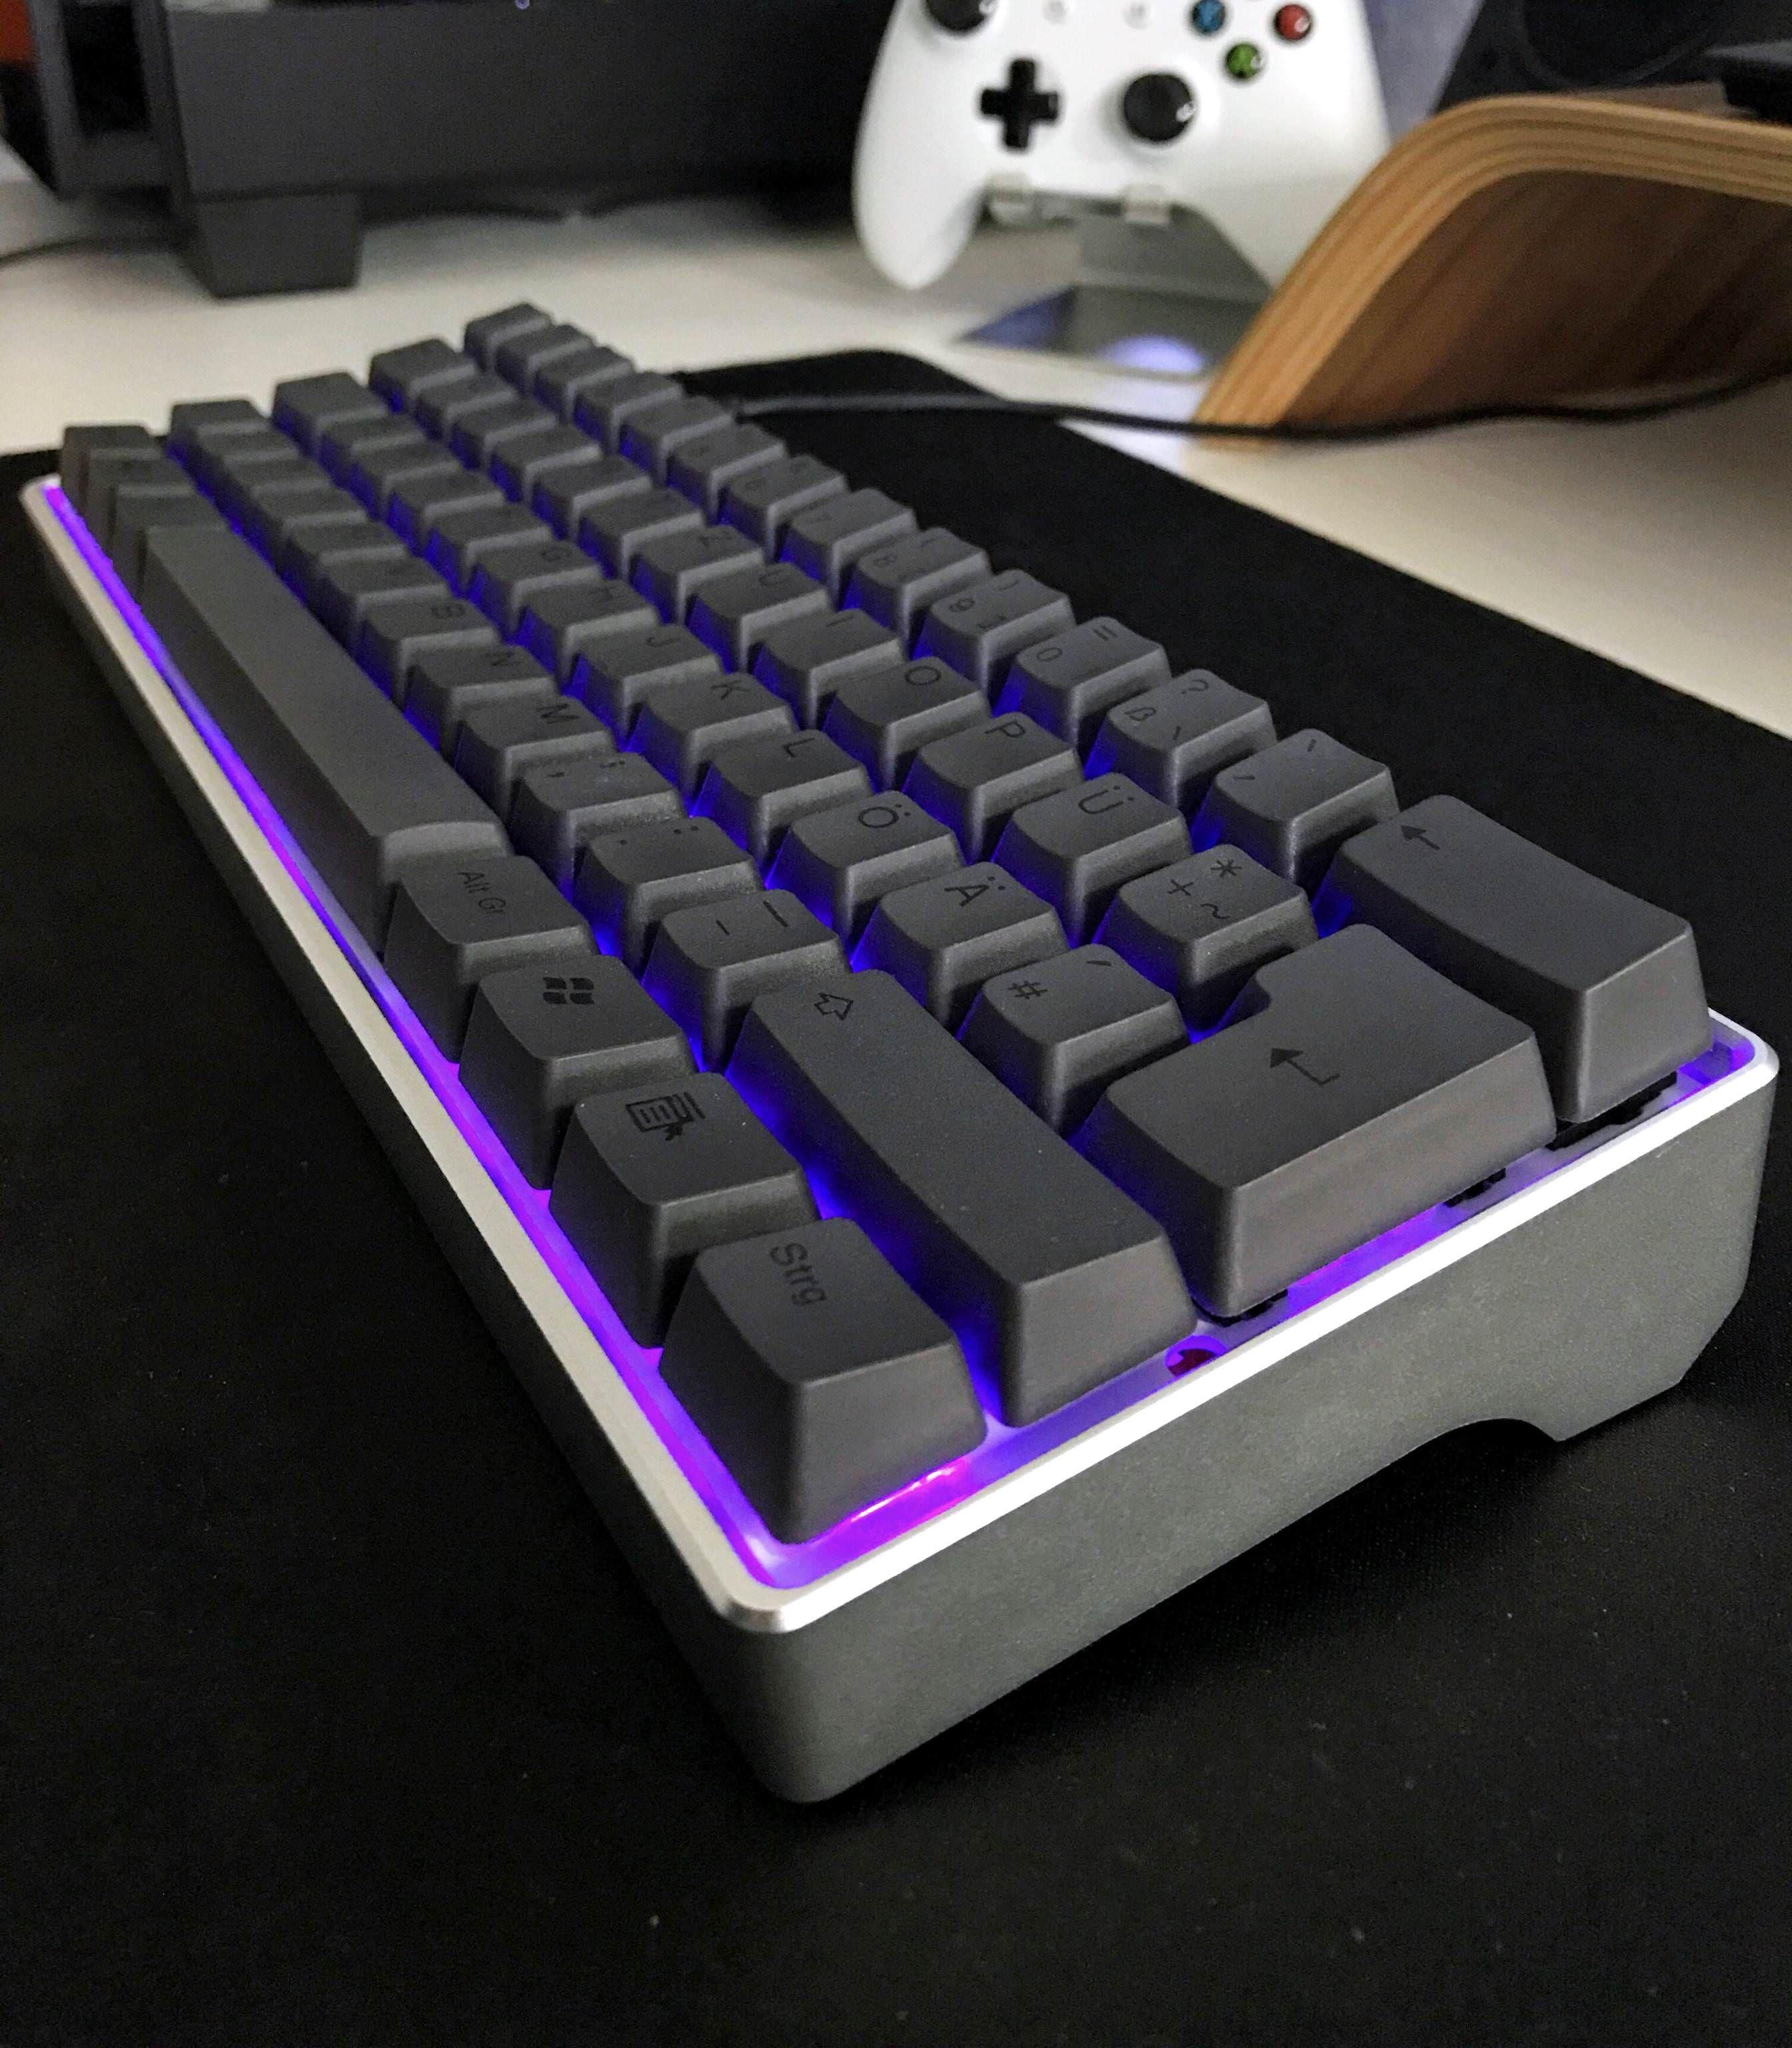 Setting up pc keyboard on mac